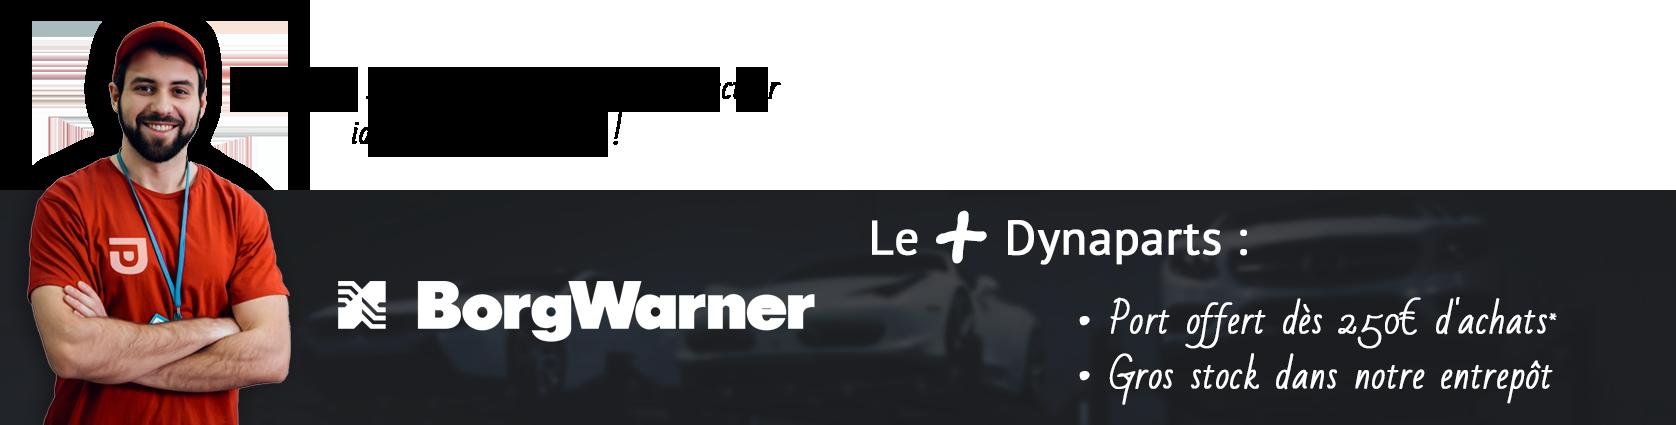 Bannière Borgwarner